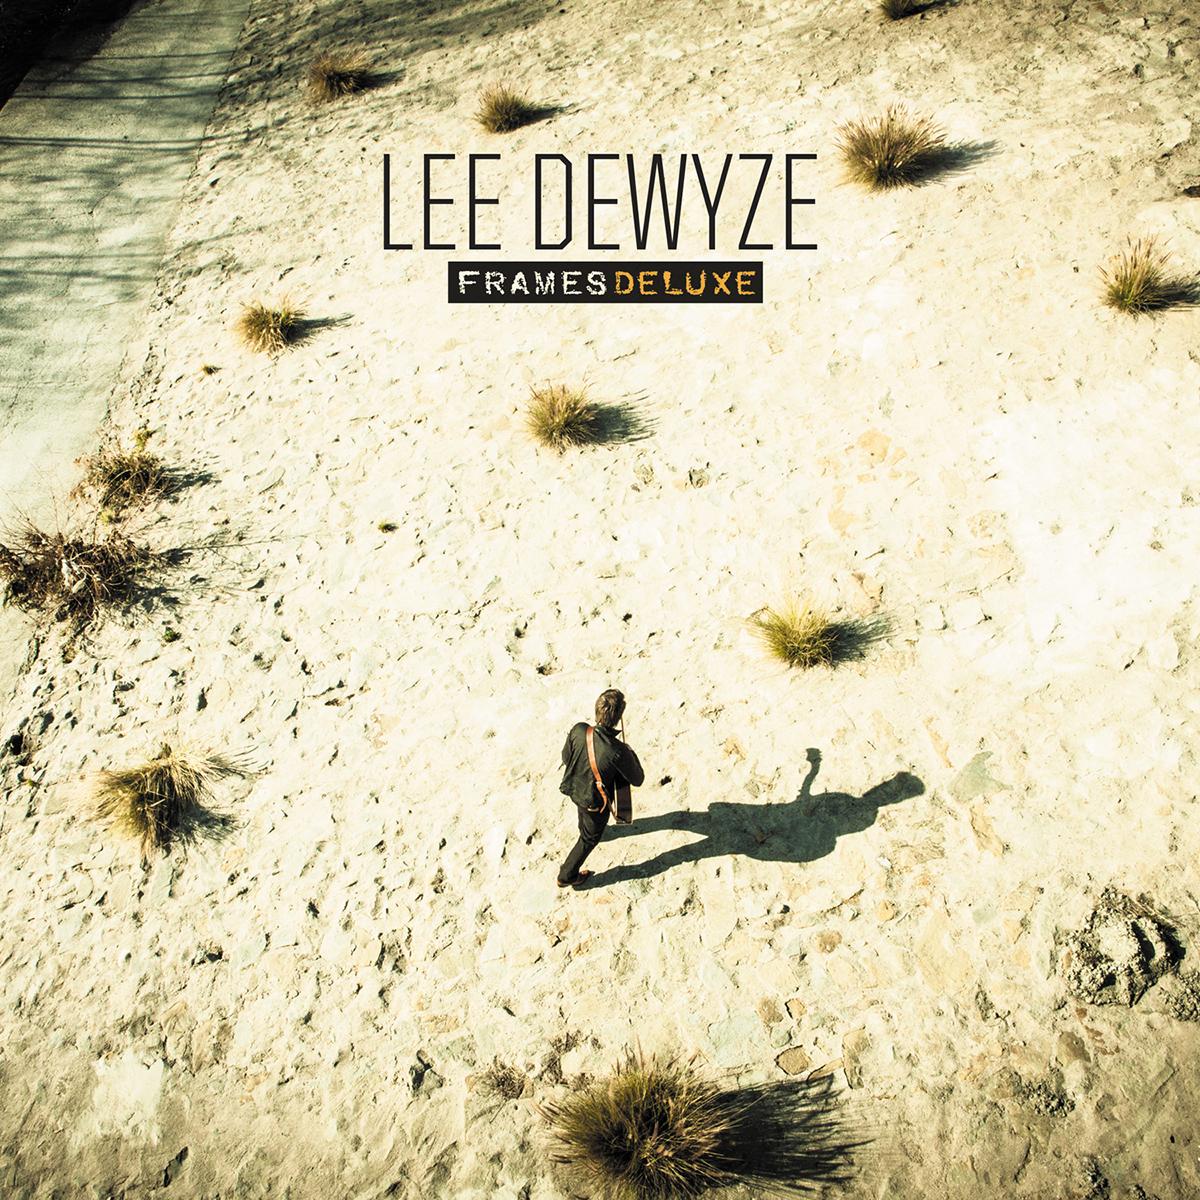 Lee DeWyze - Frames (Deluxe) CD